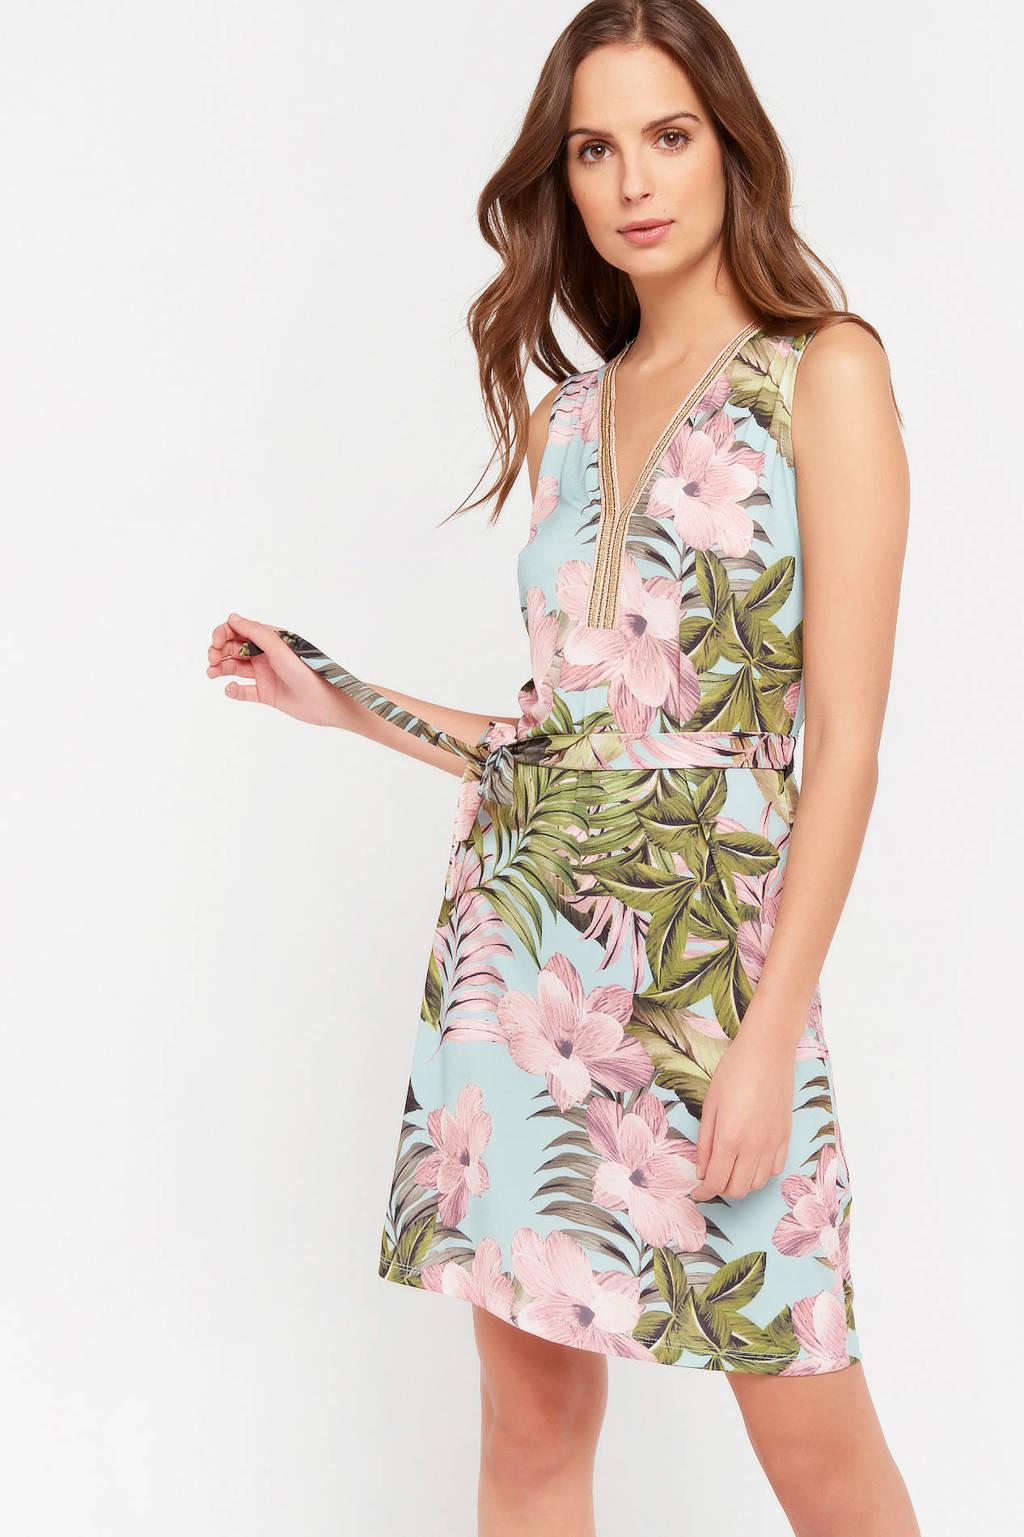 LOLALIZA gebloemde jurk blauw/roze, Blauw/roze